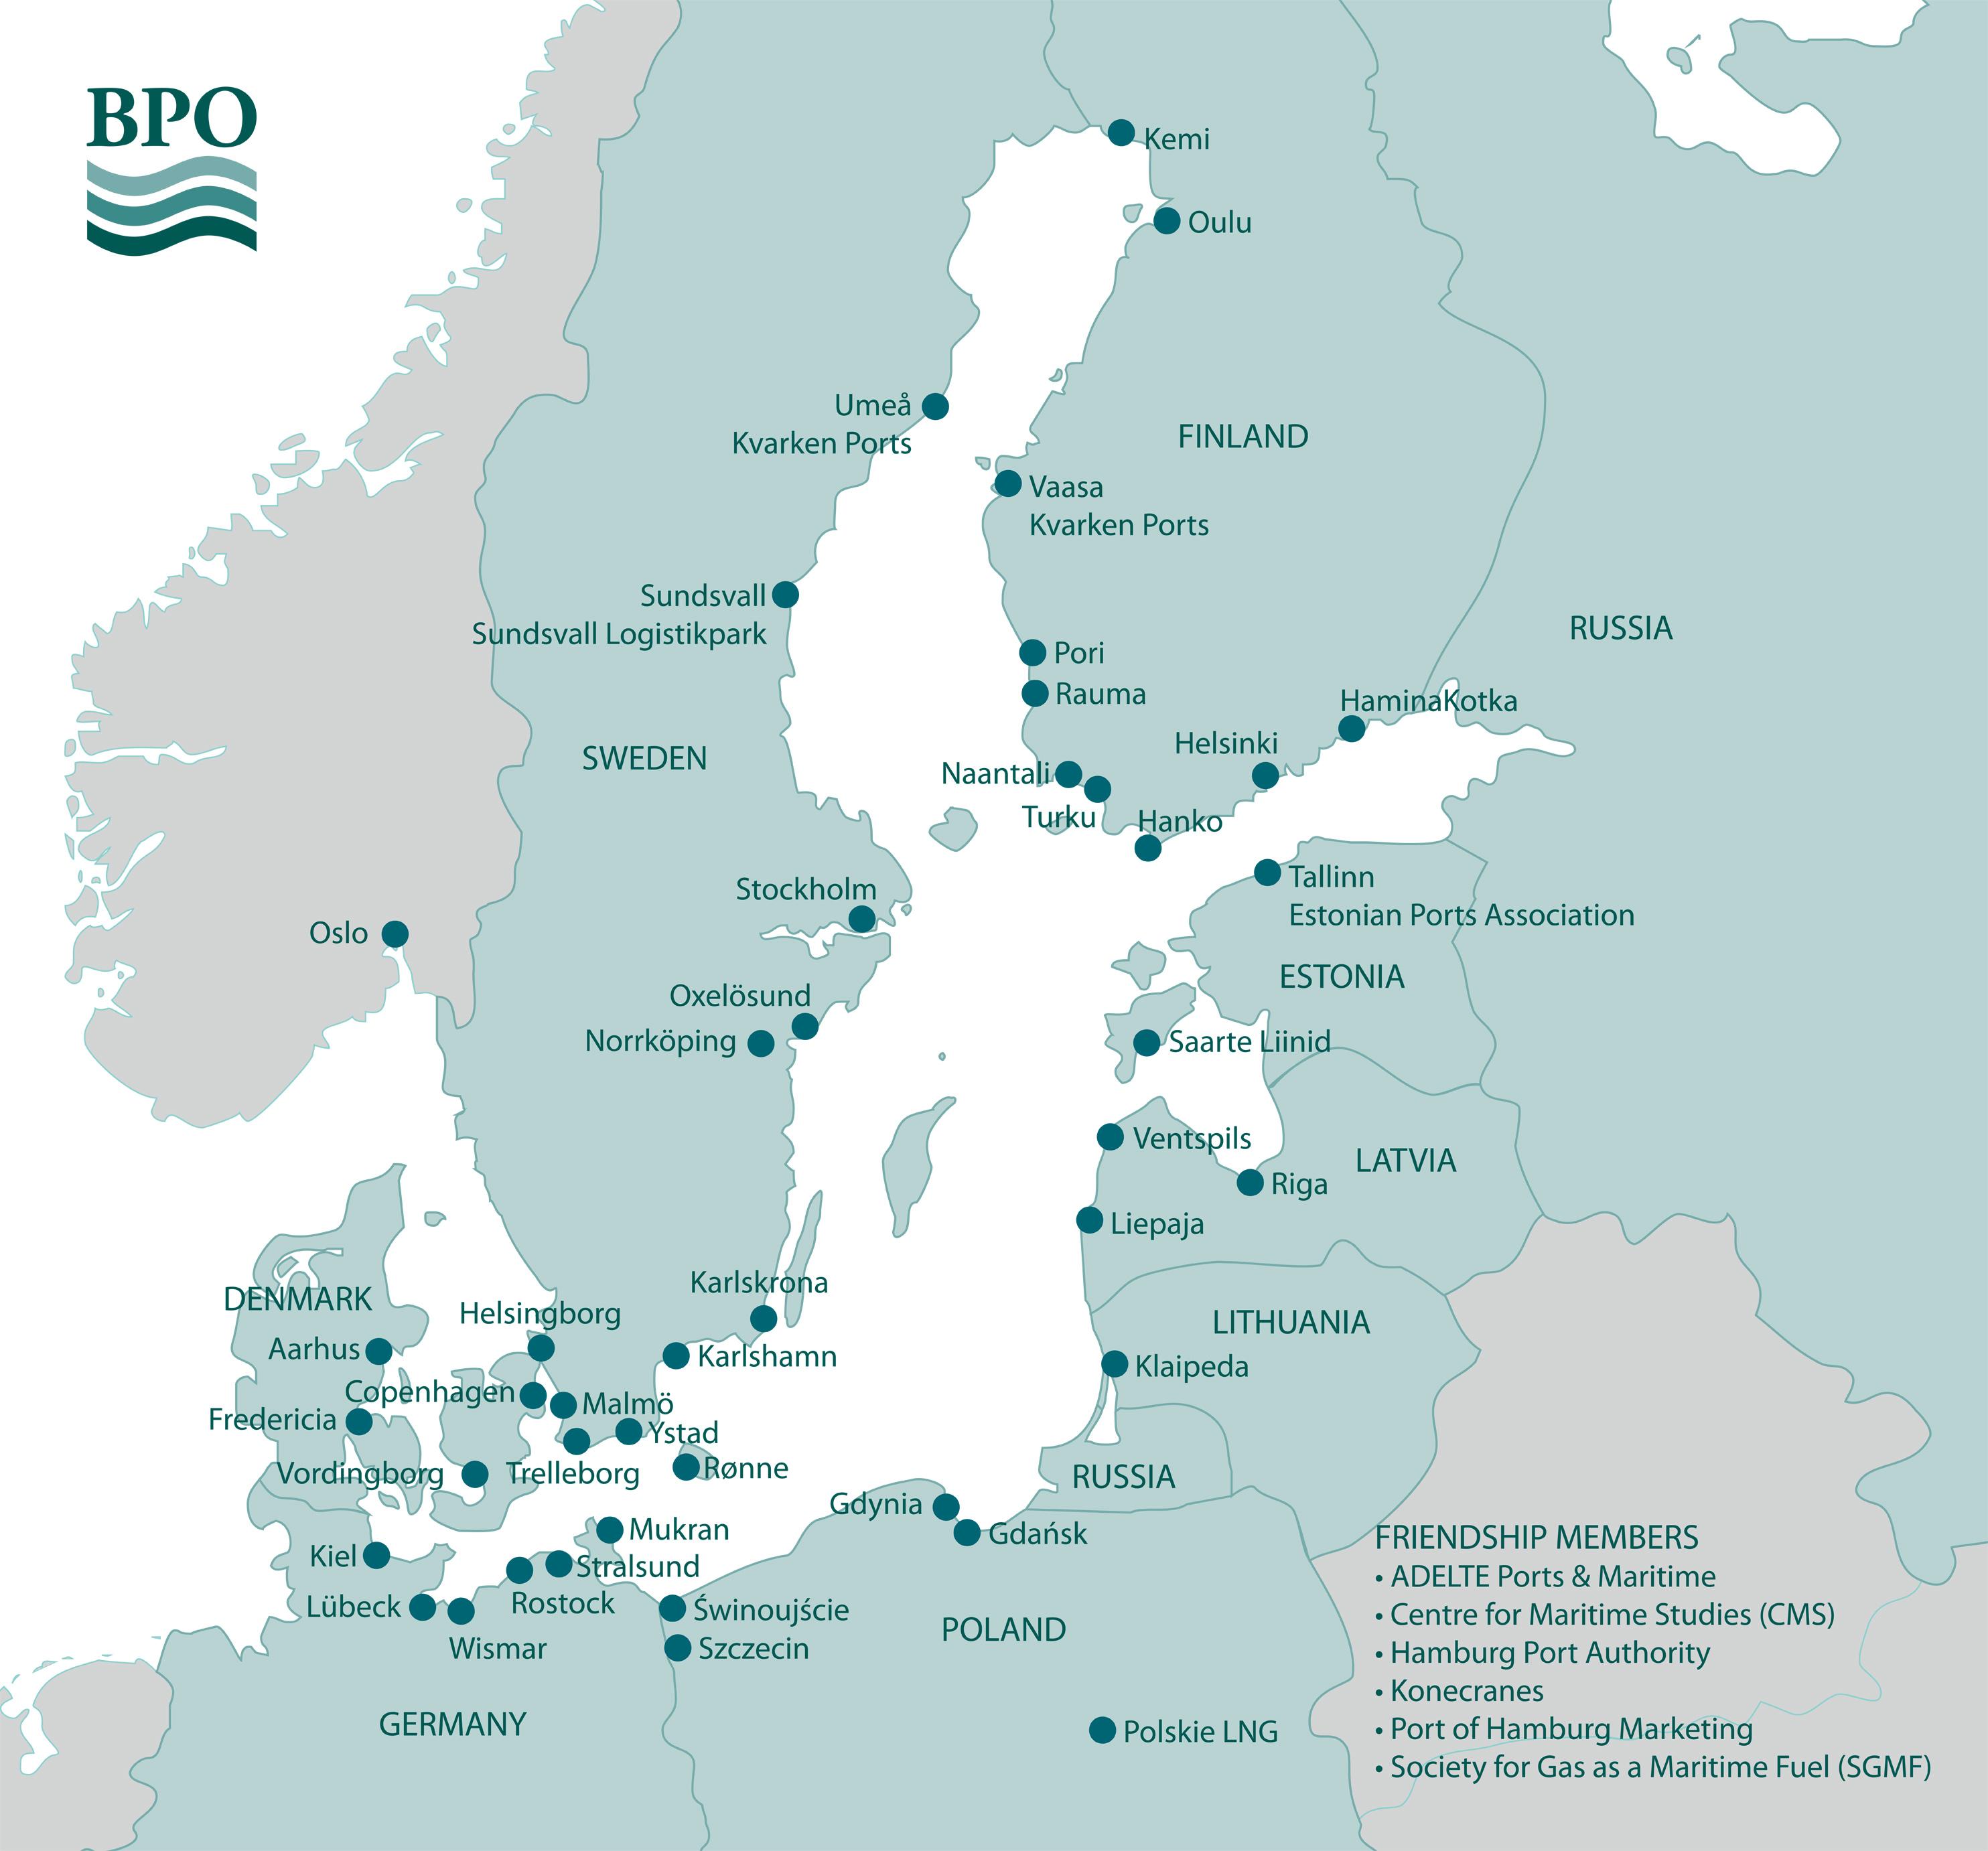 Baltic Ports Organization - About BPO